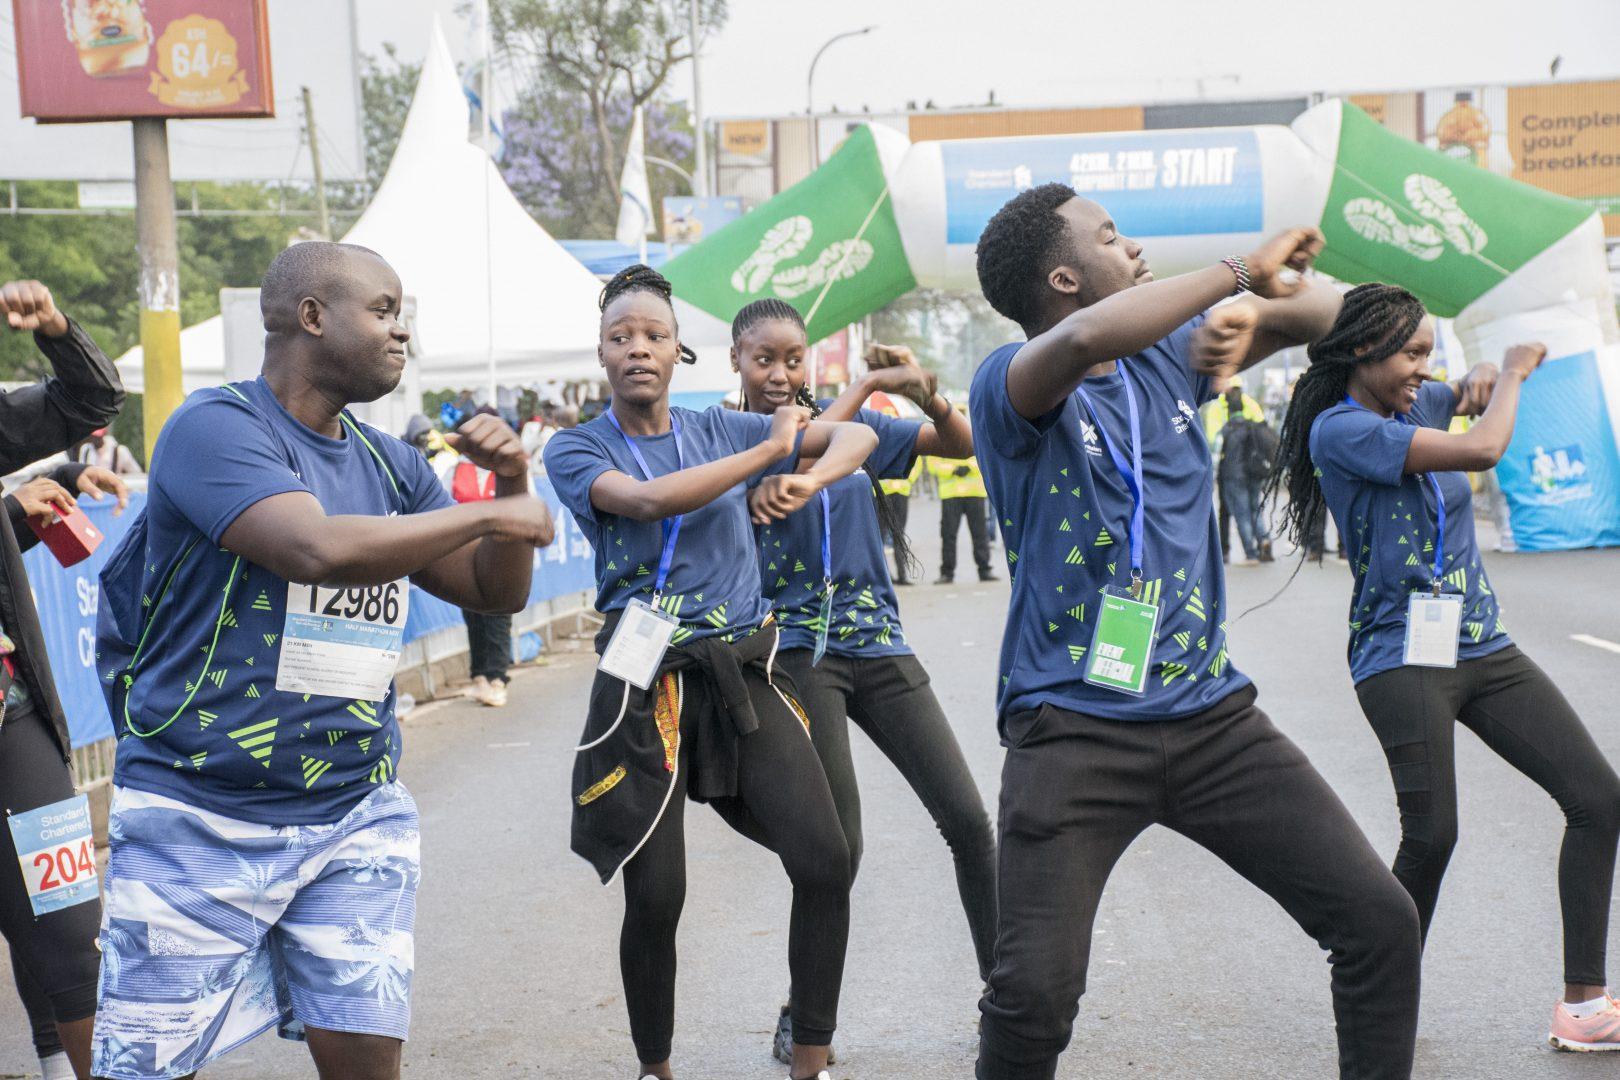 https://www.nairobimarathon.com/wp-content/uploads/2021/07/DSC_2852.jpg